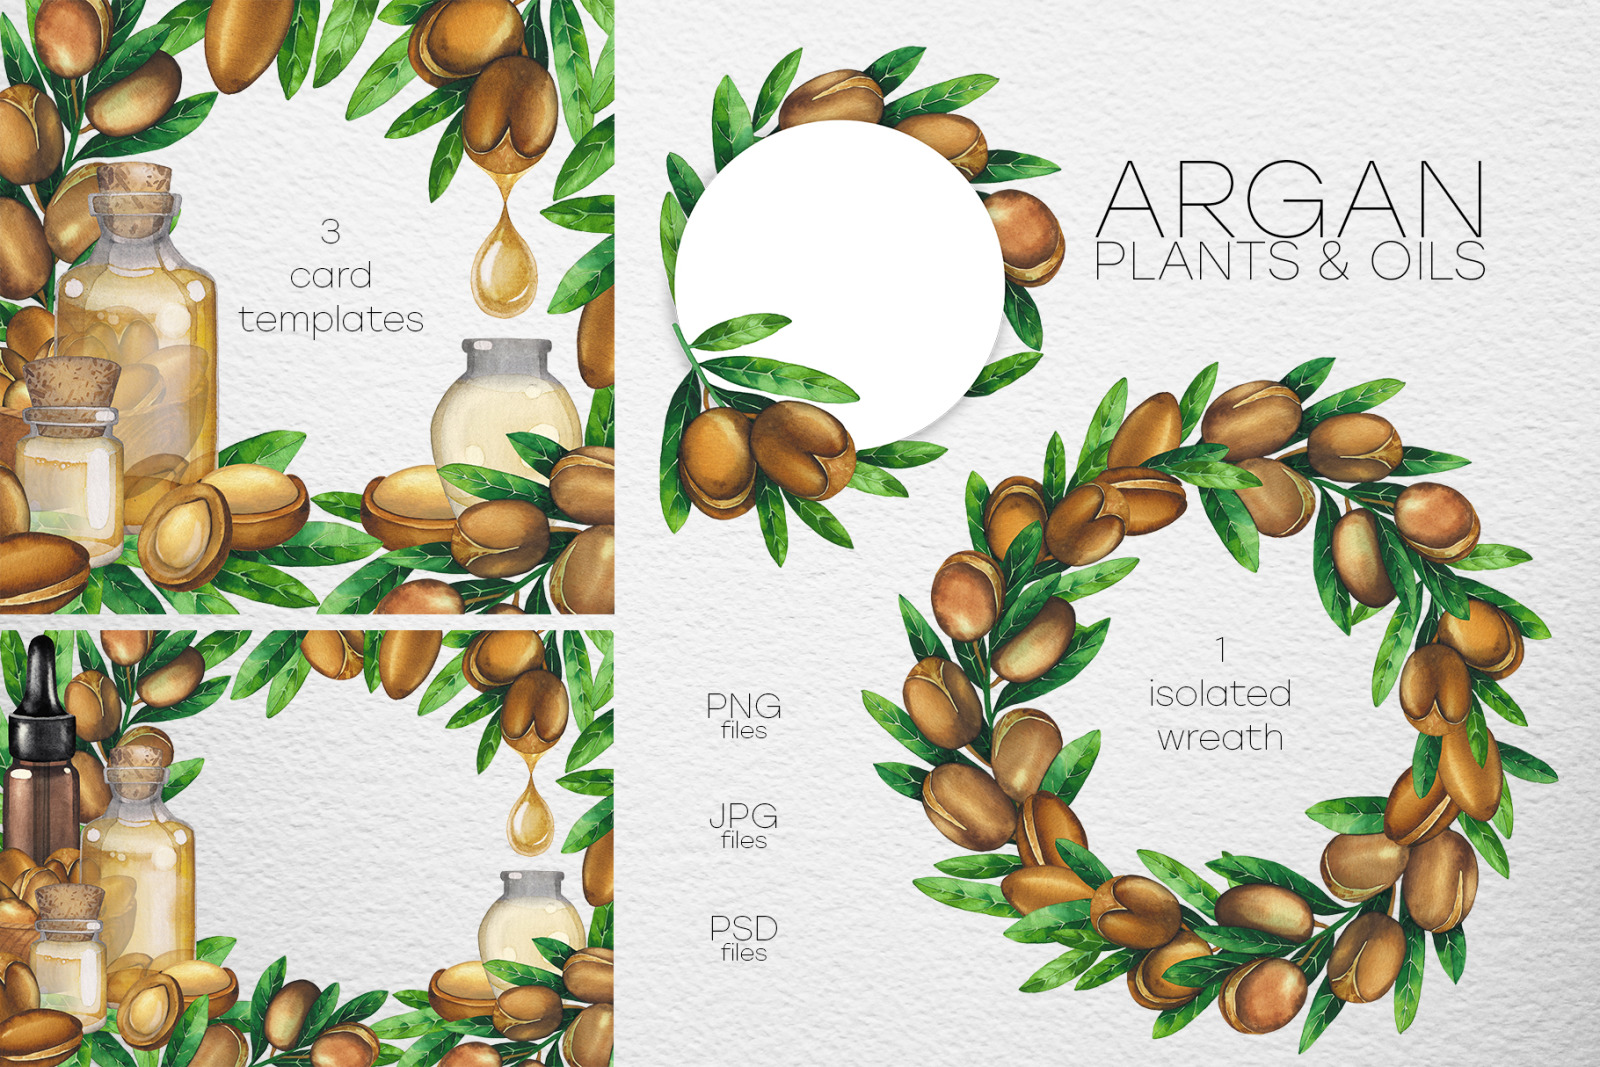 Watercolor argan plants and oils